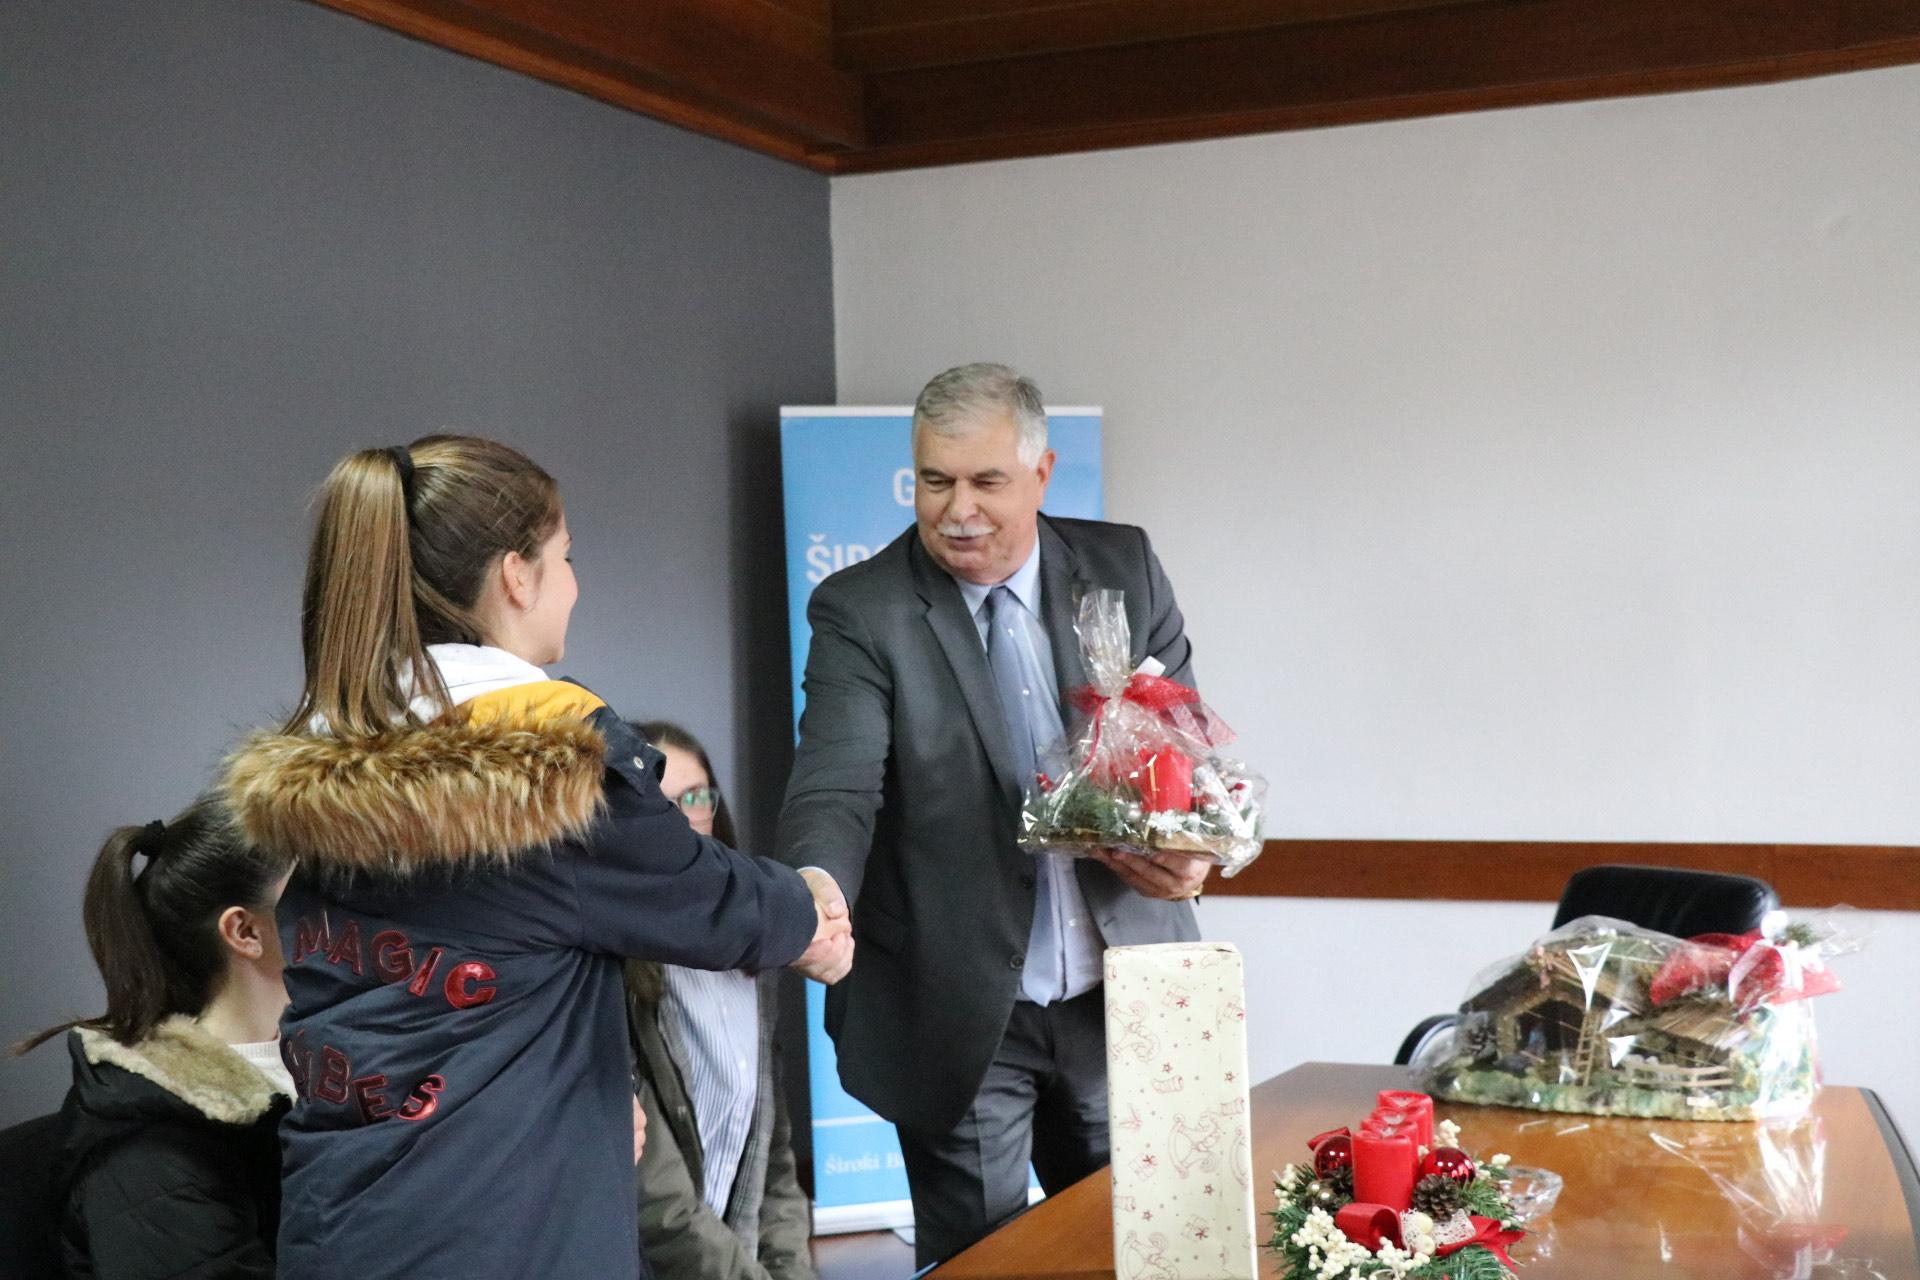 Gradonačelnik Kraljević primio članove ekološke sekcije Prve osnovne škole Široki Brijeg